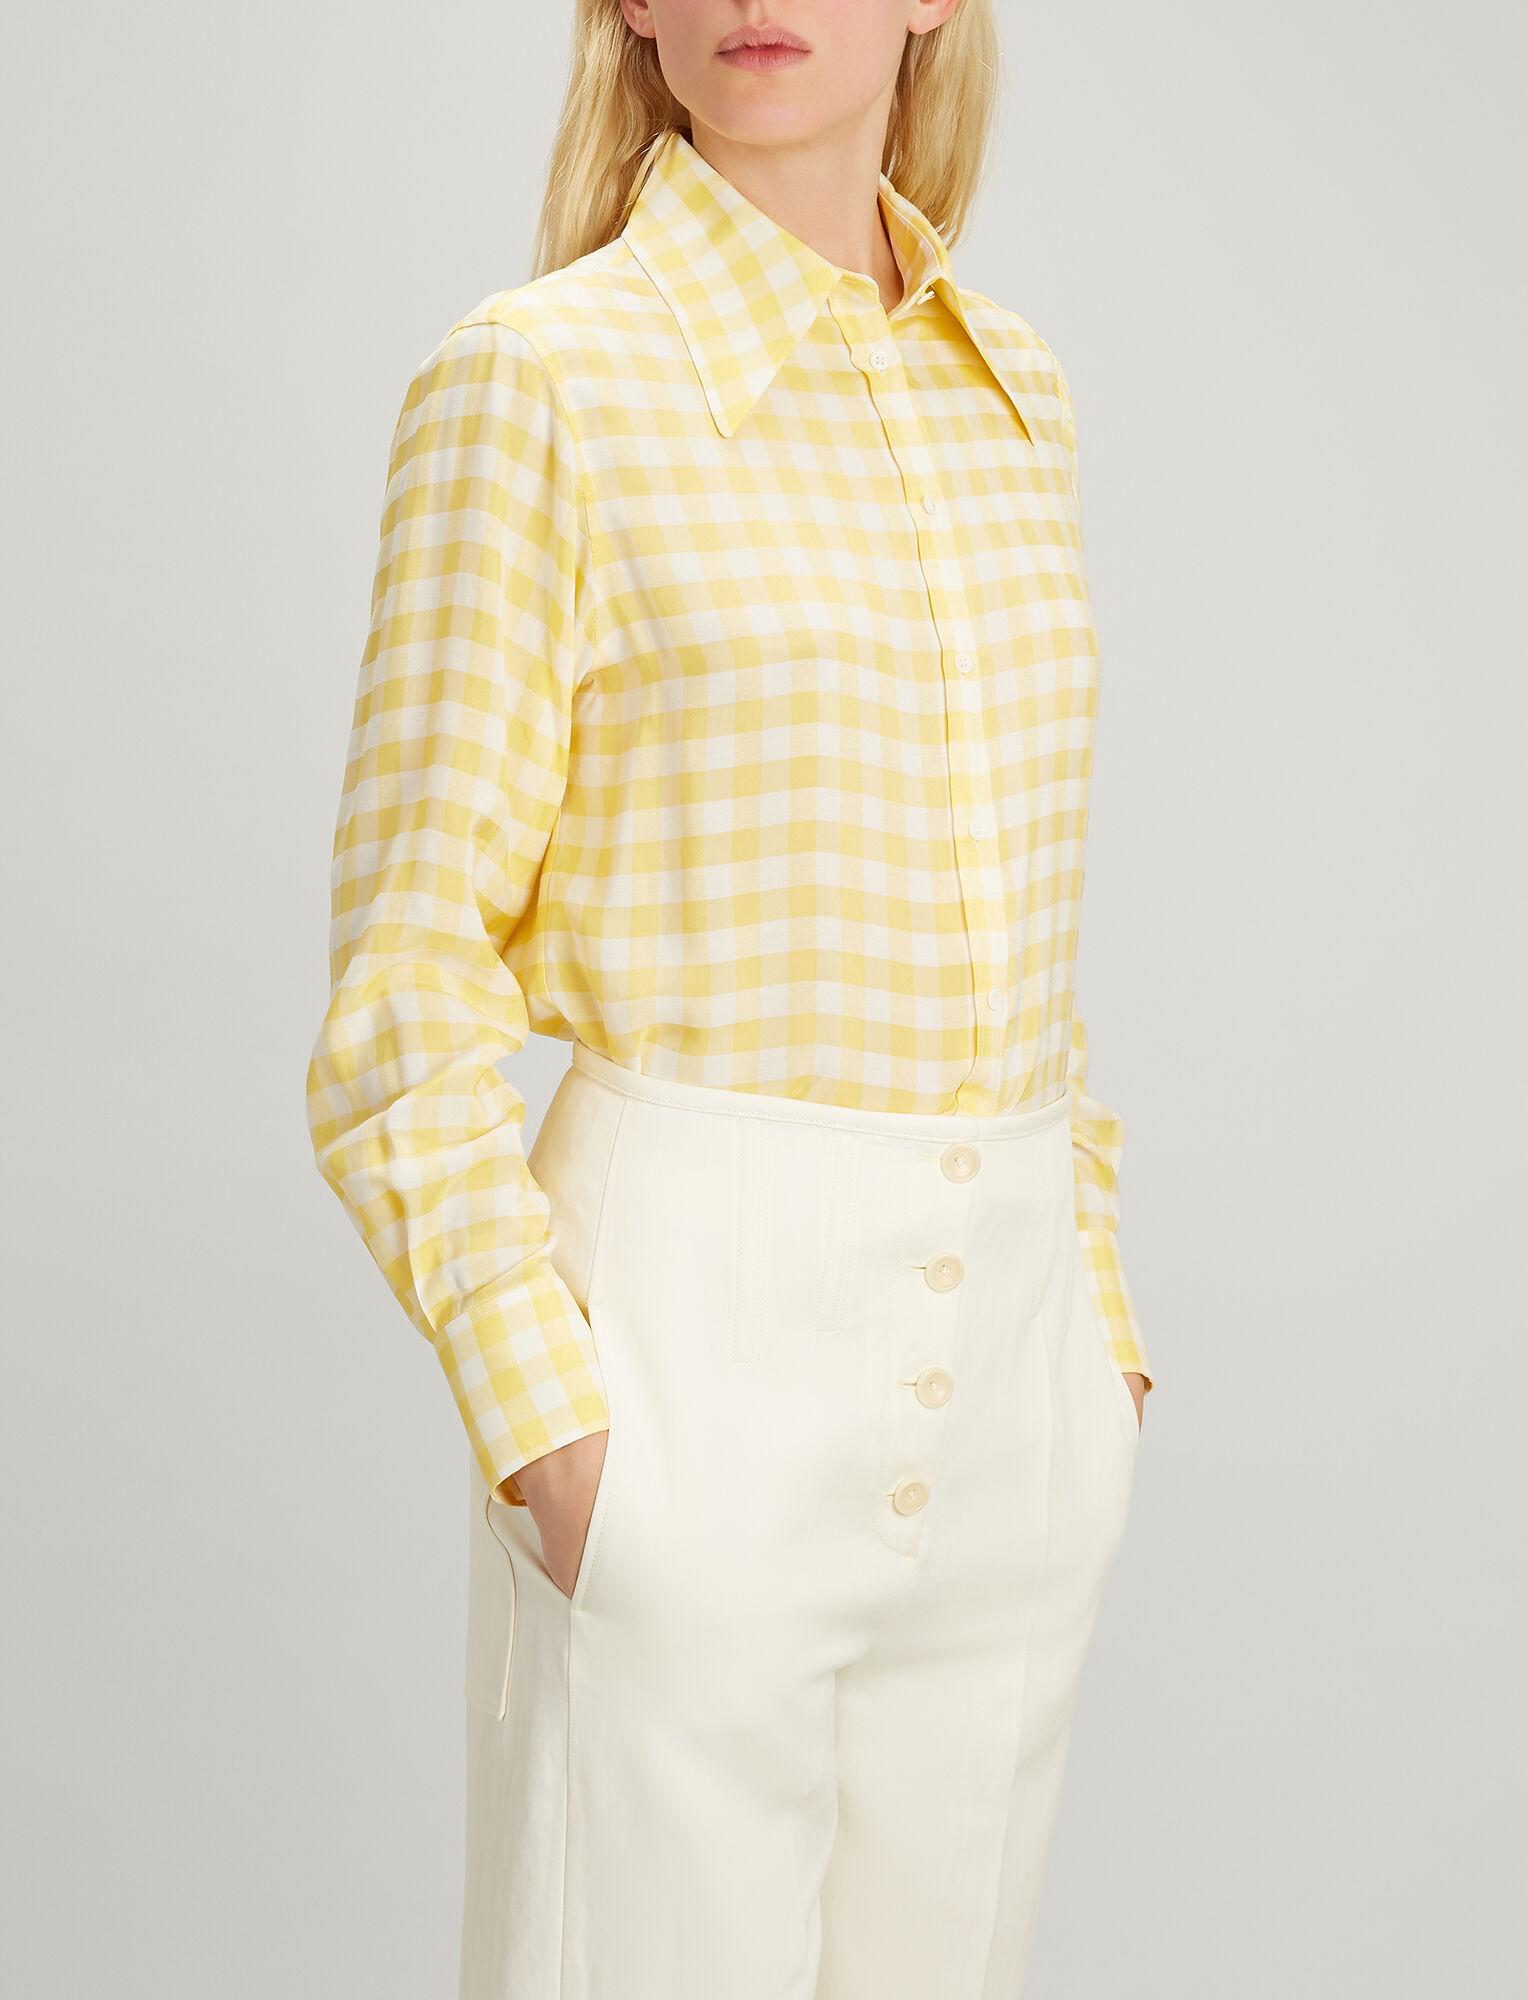 Joseph Woman Silk Top Pink Size 42 Joseph Supply Cheap Online Sale Outlet oeOwKgqc